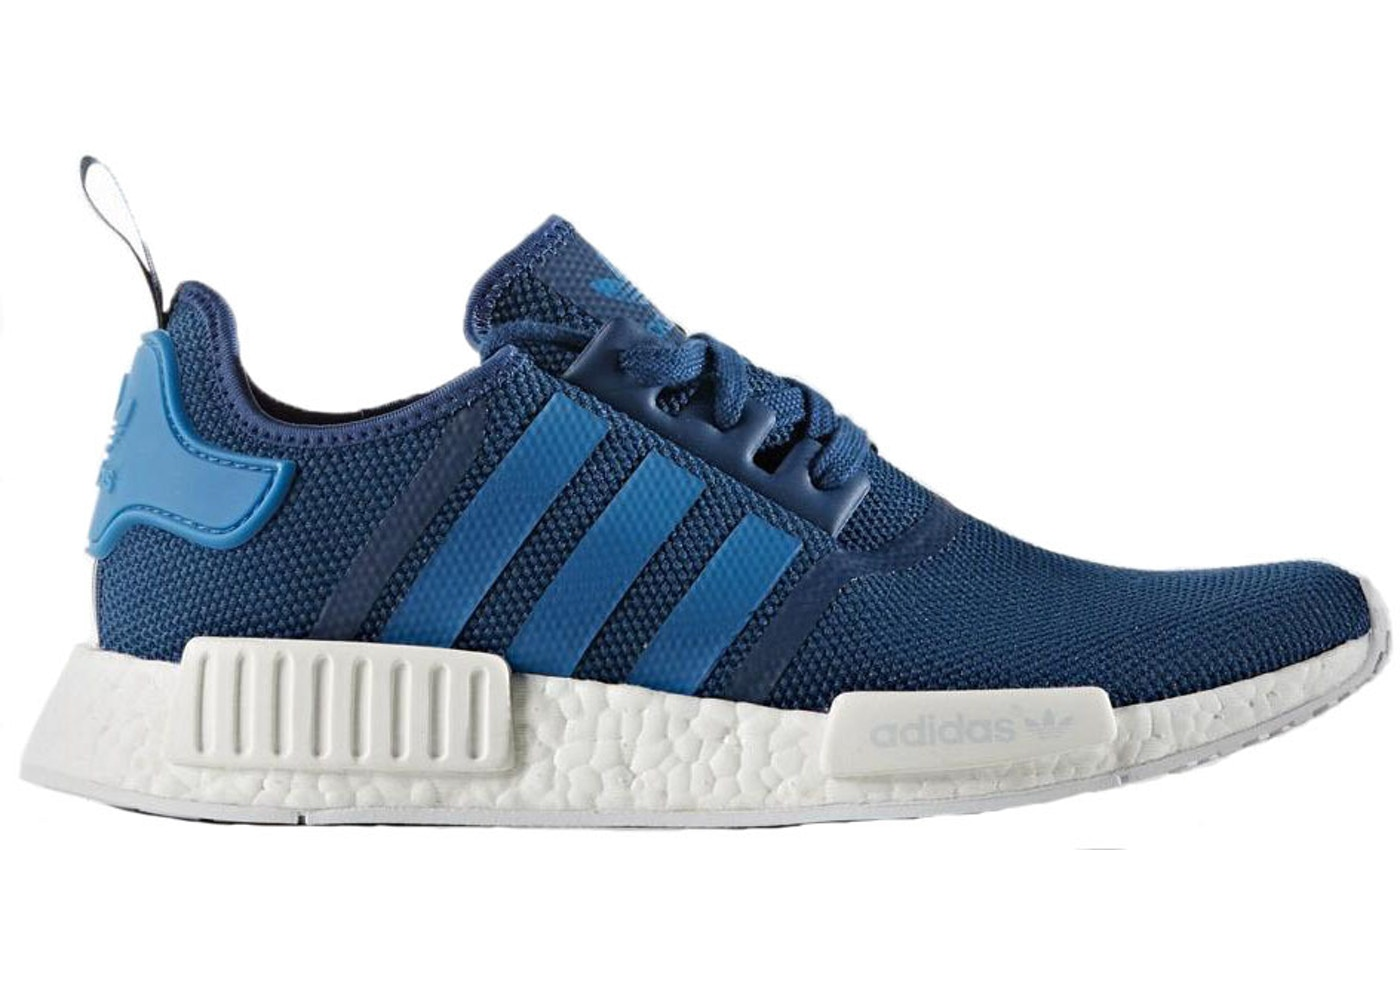 online retailer 963d7 ce8b0 adidas NMD R1 Blue White